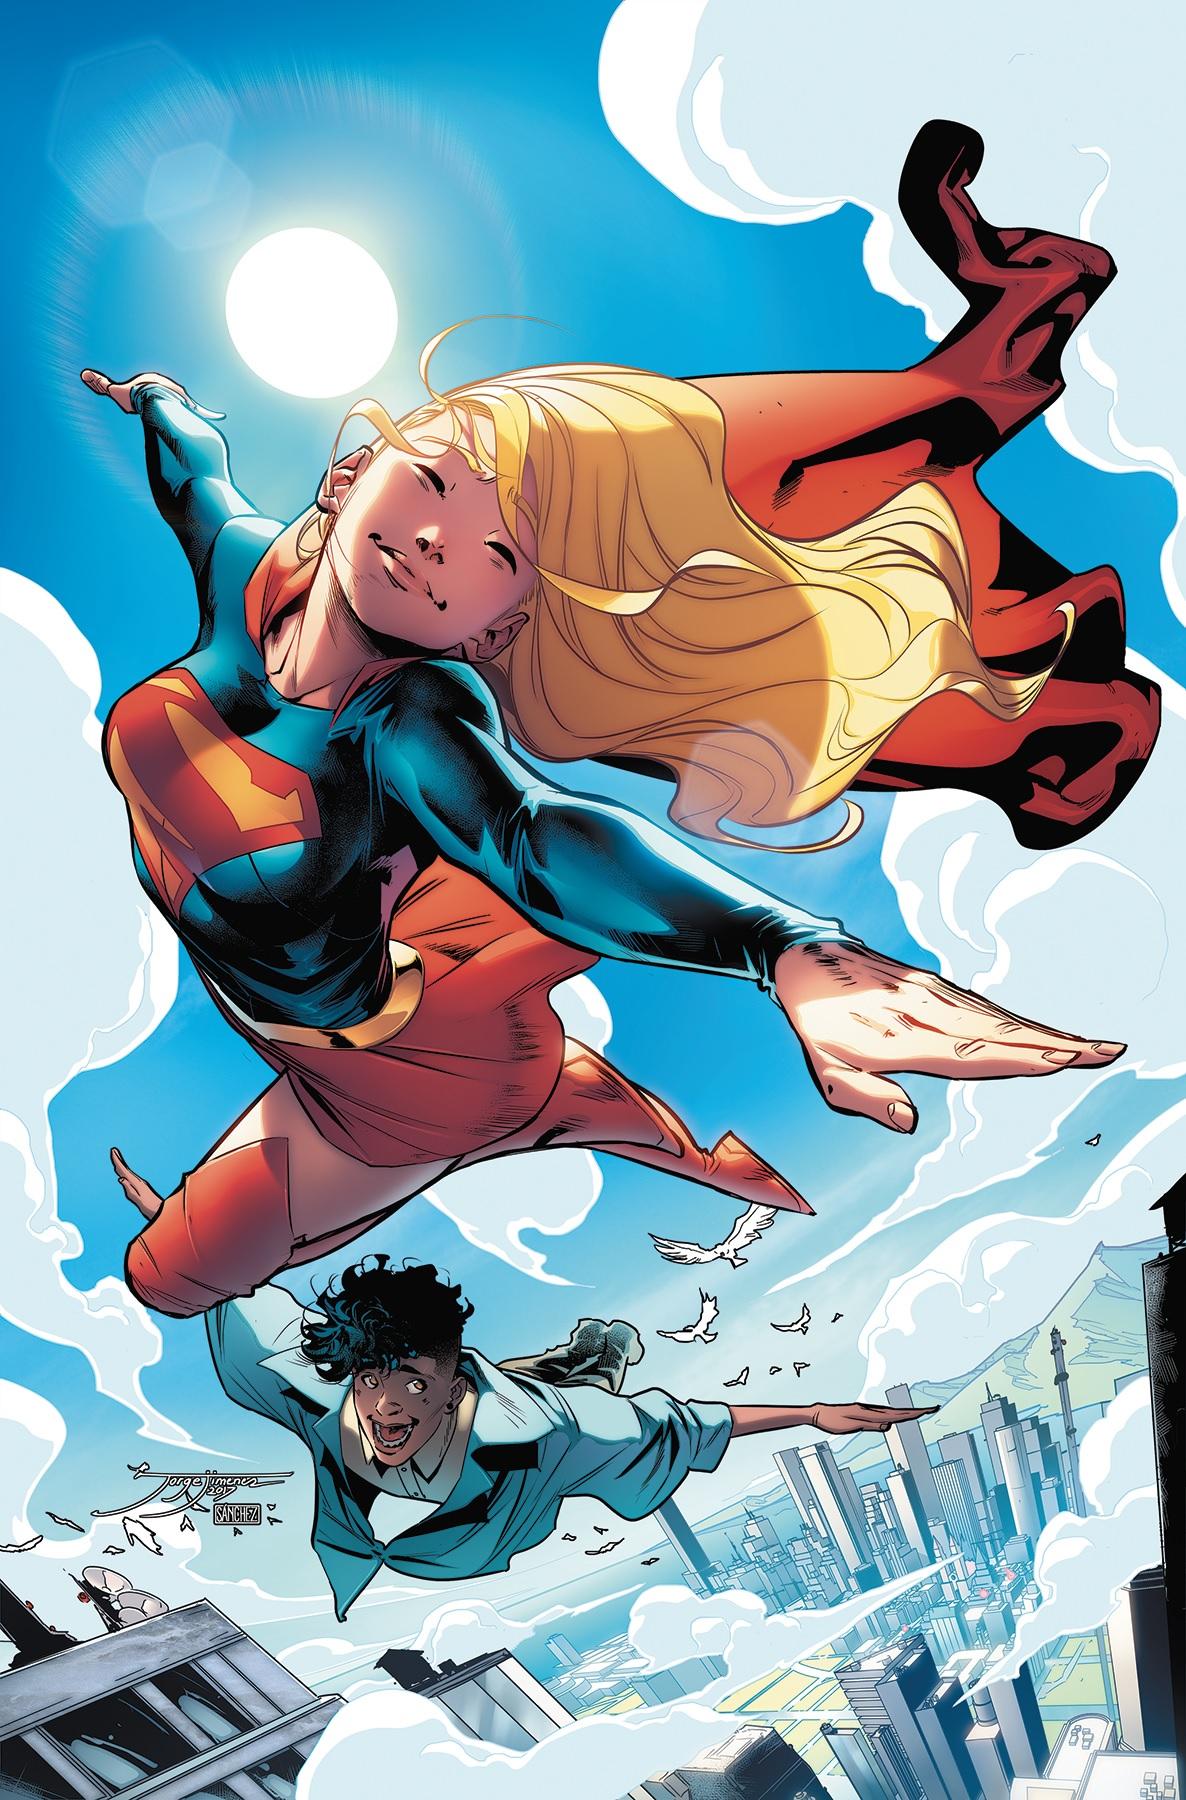 Supergirl Vol 7 19 Textless.jpg